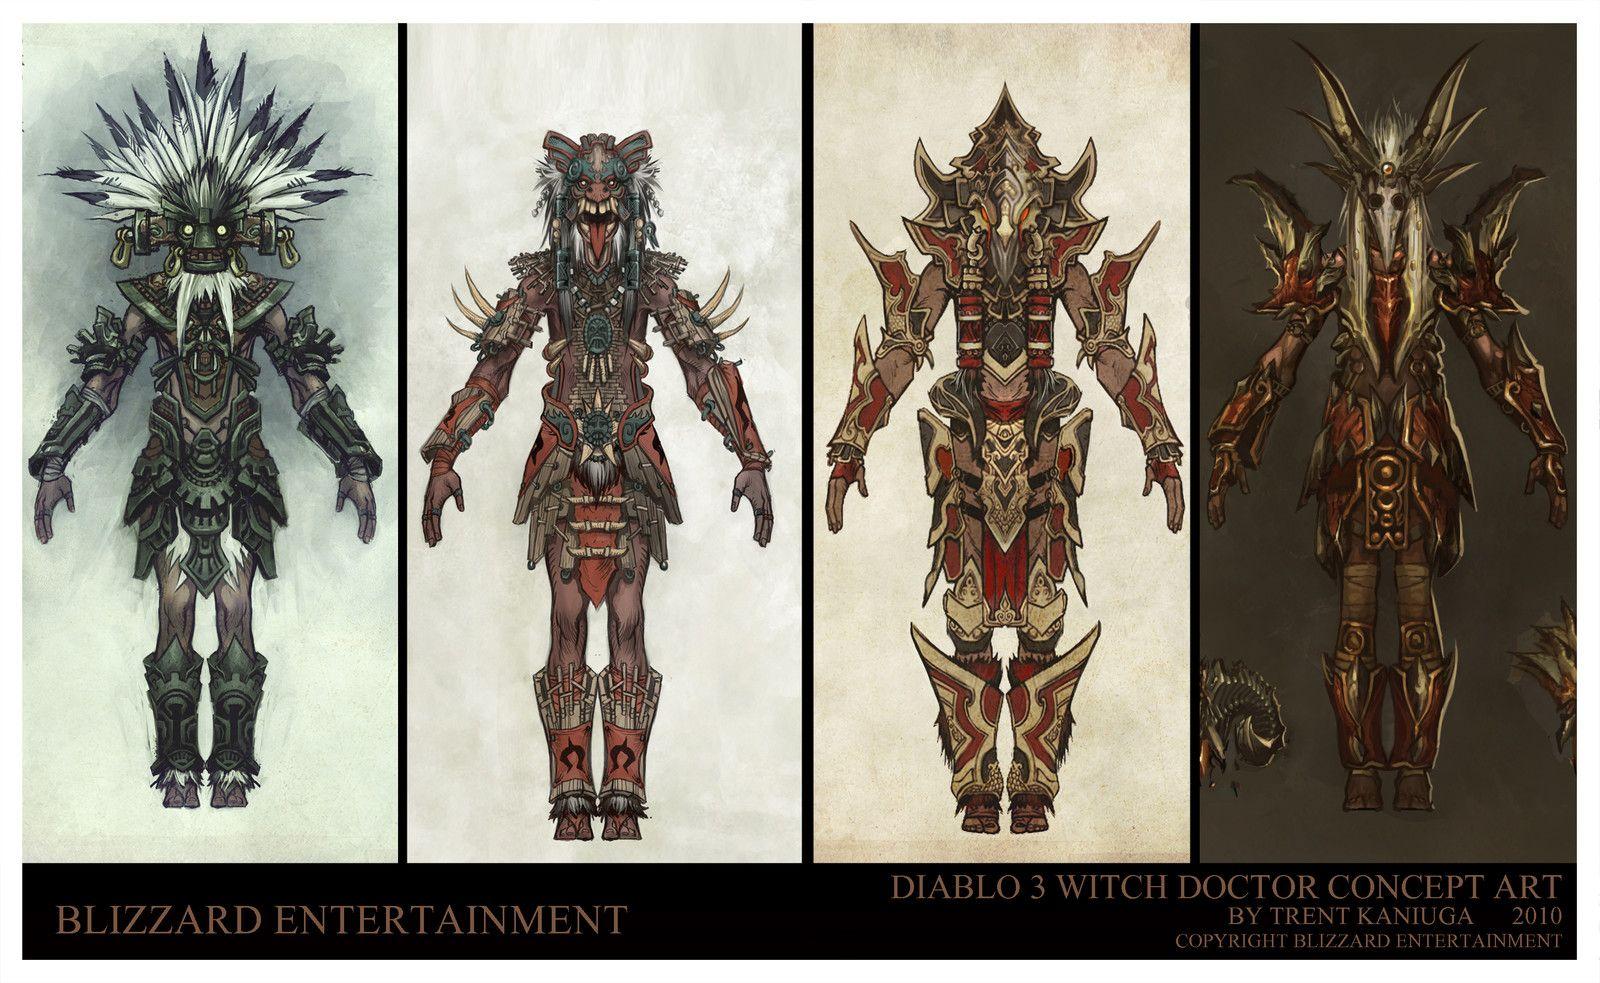 Diablo 3 - Witch Doctor Armor designs, Trent Kaniuga - Aquatic Moon on ArtStation at https://www.artstation.com/artwork/qEEBR